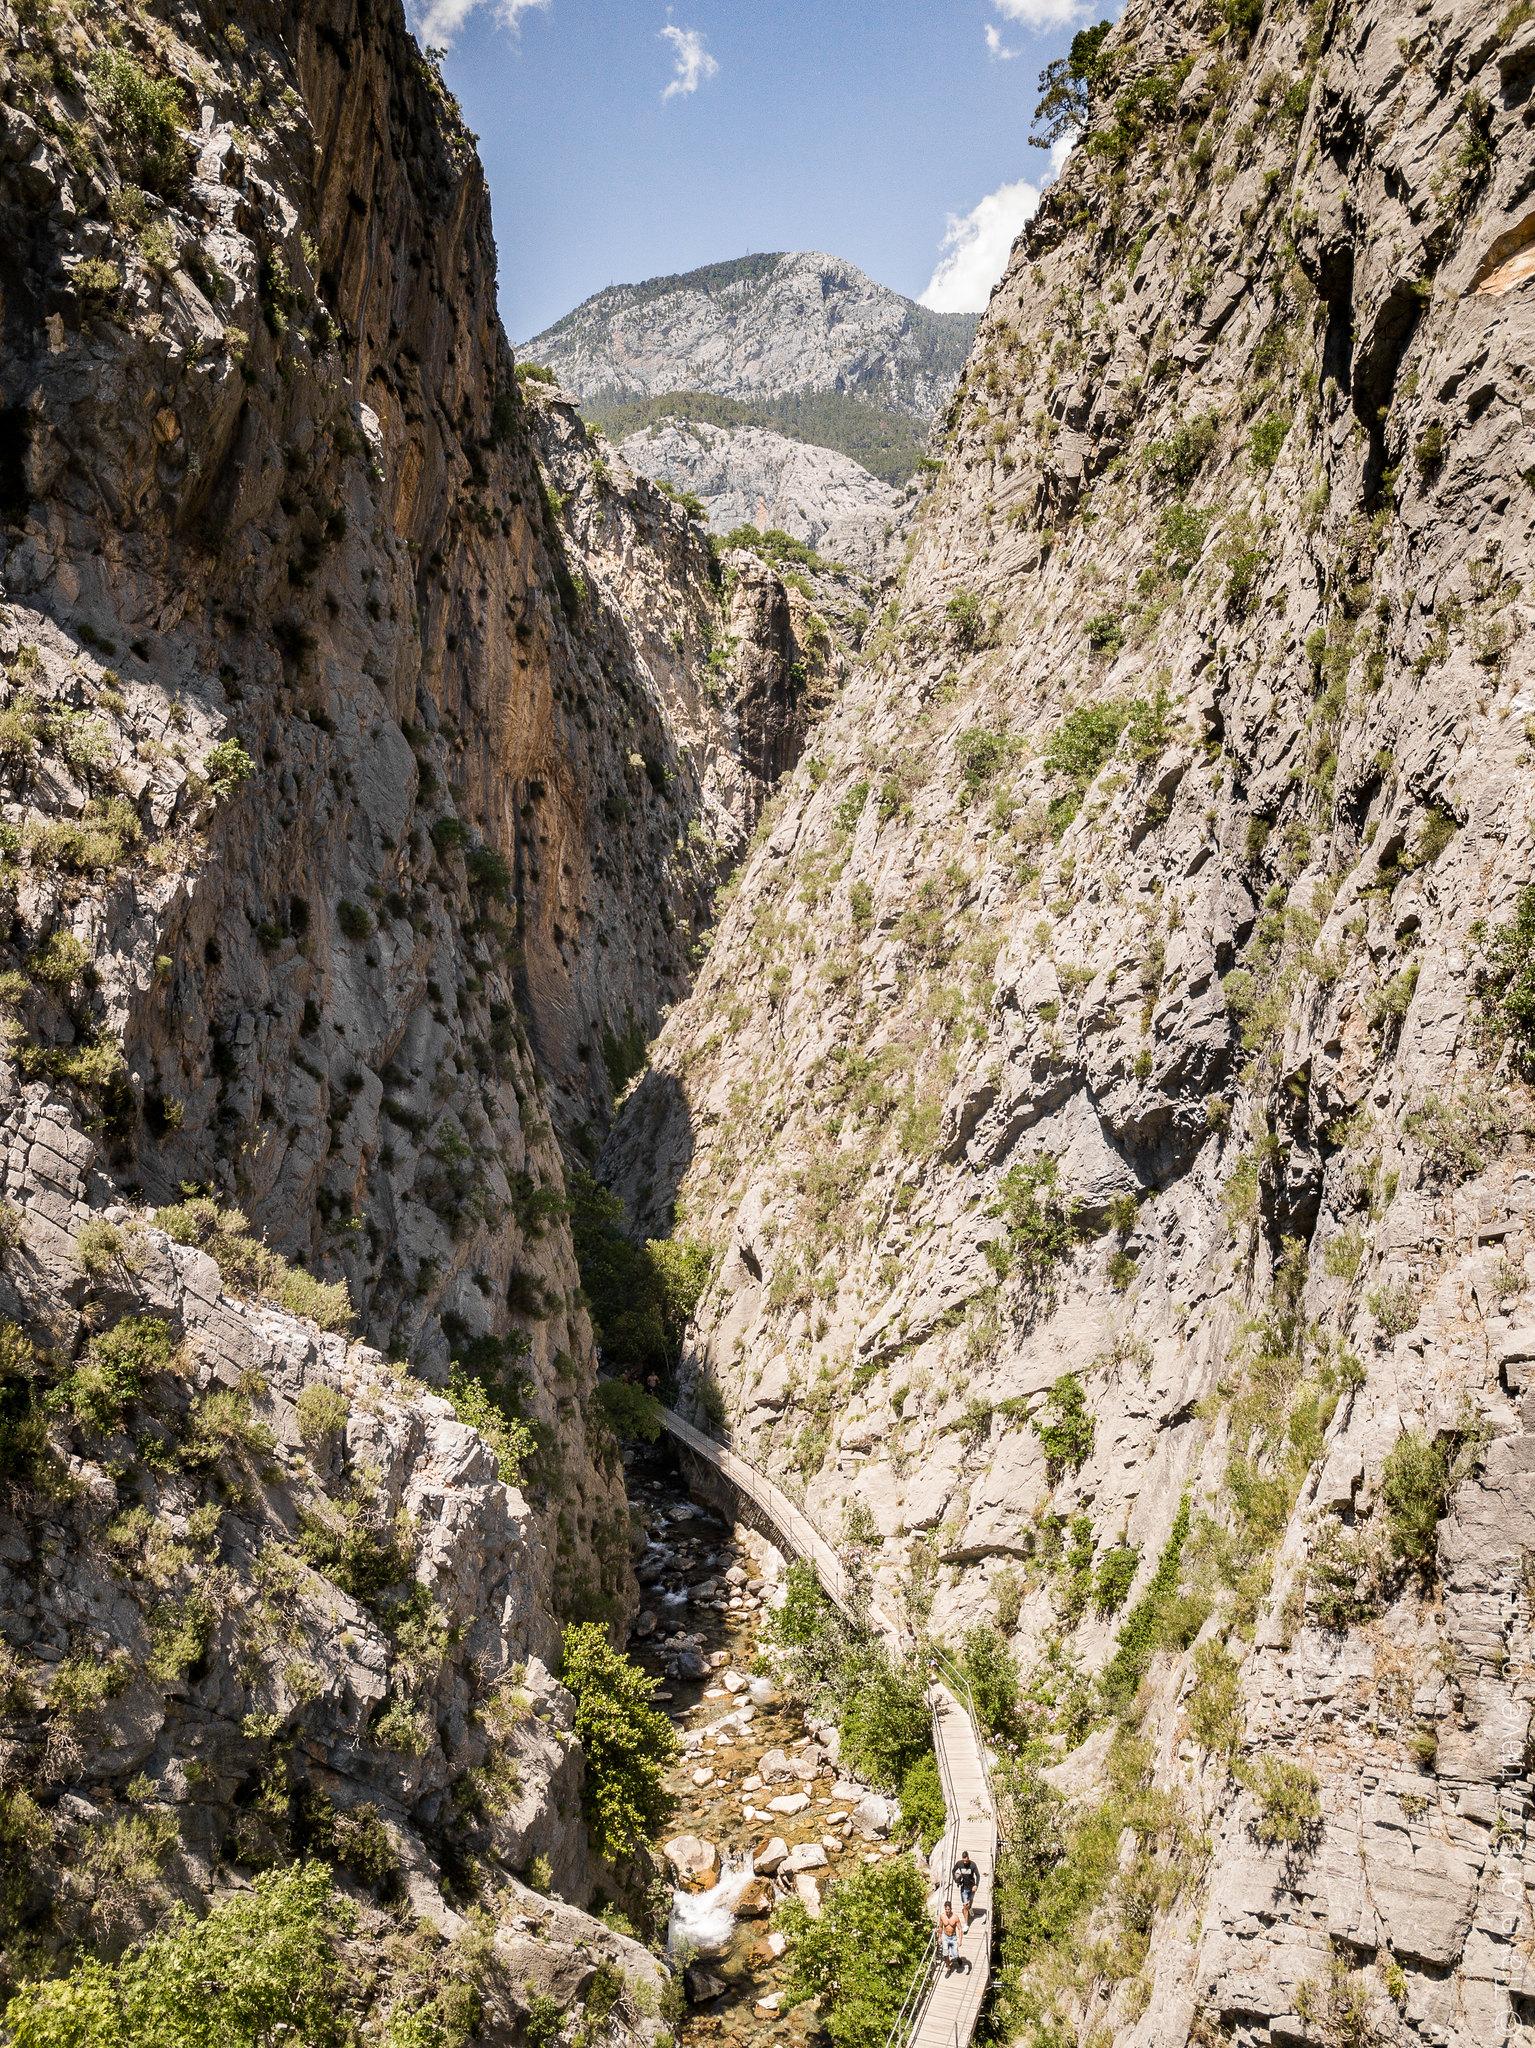 Sapadere-Canyon-Tour-экскурсия-в-каньон-сападере-mavic-0570